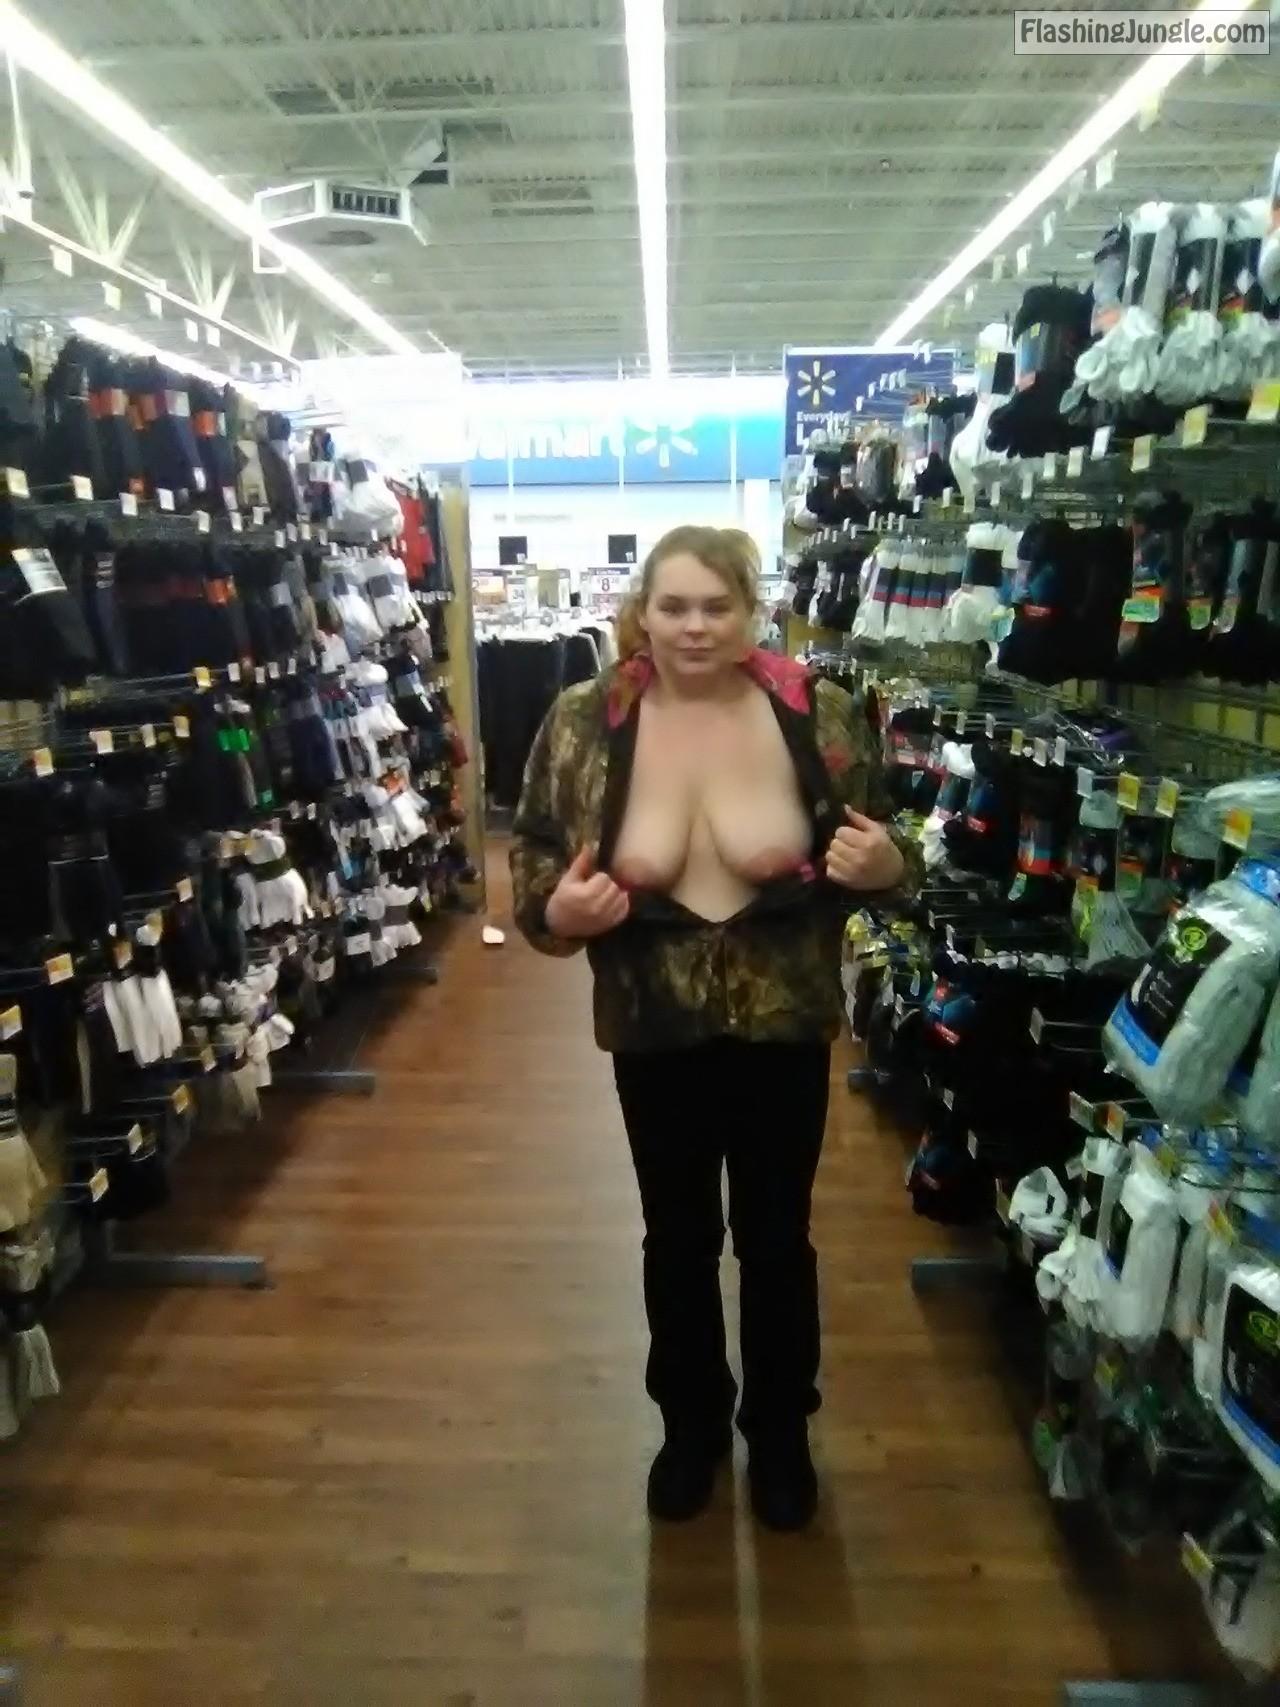 Xxxgifs tumblr amateur naked agree